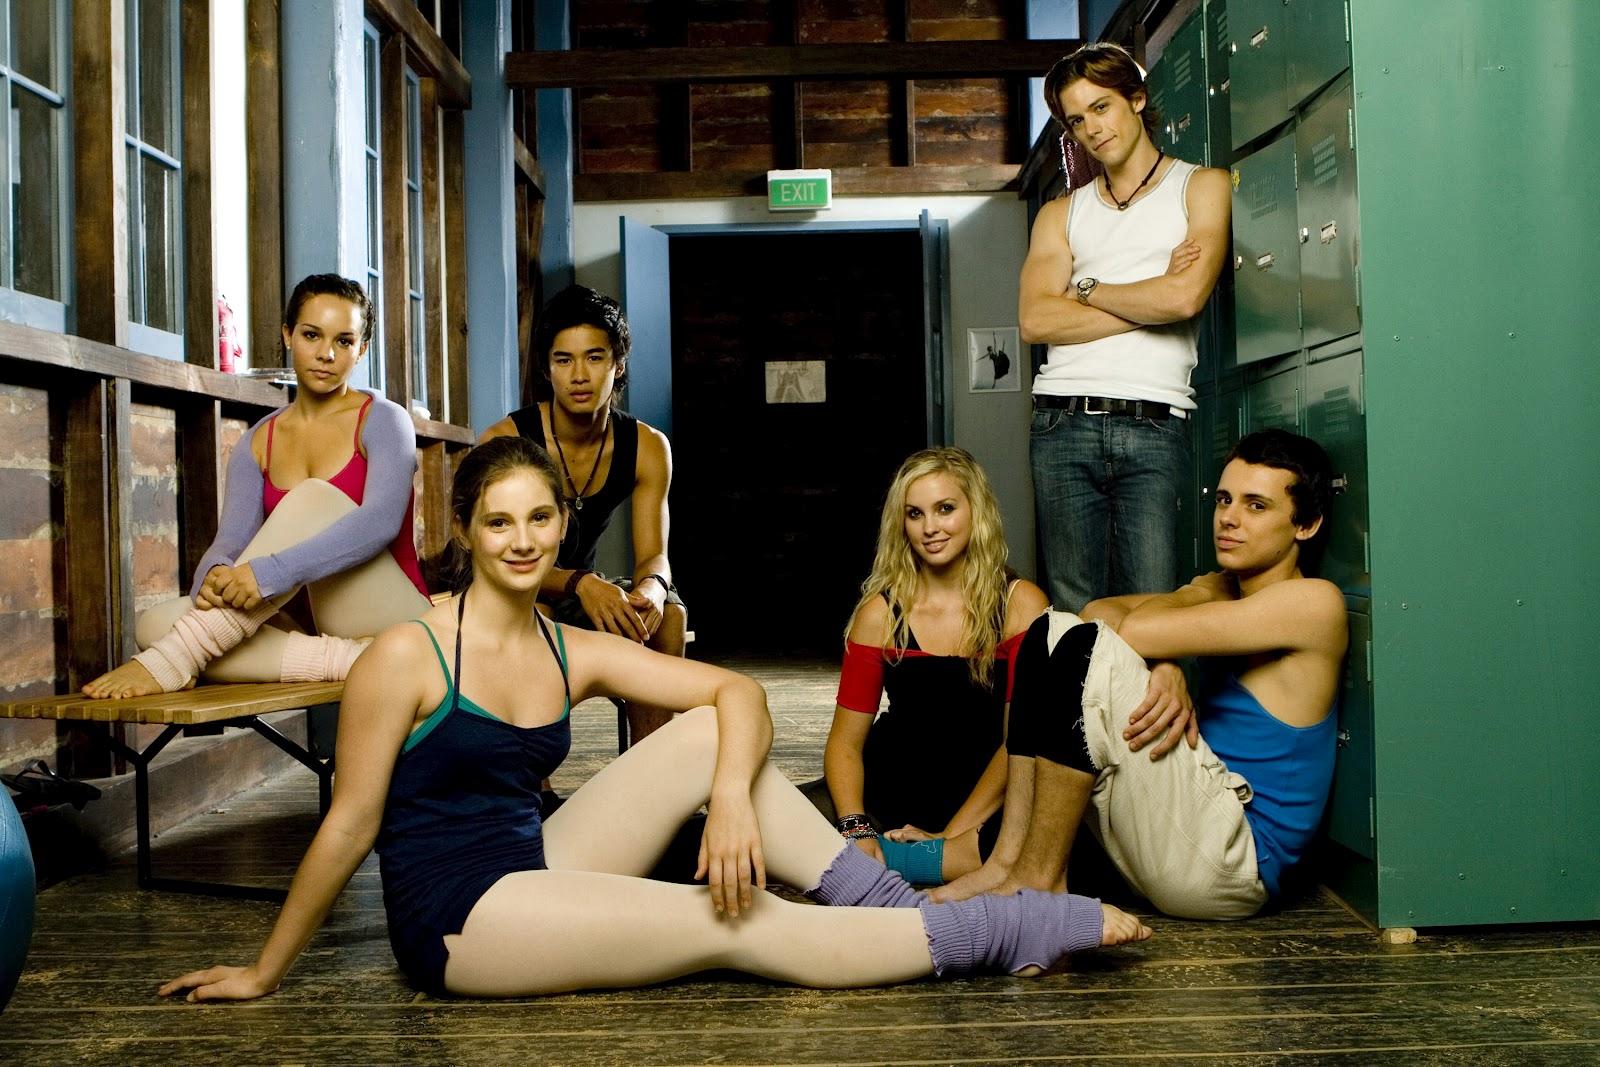 Dance academy cast dating